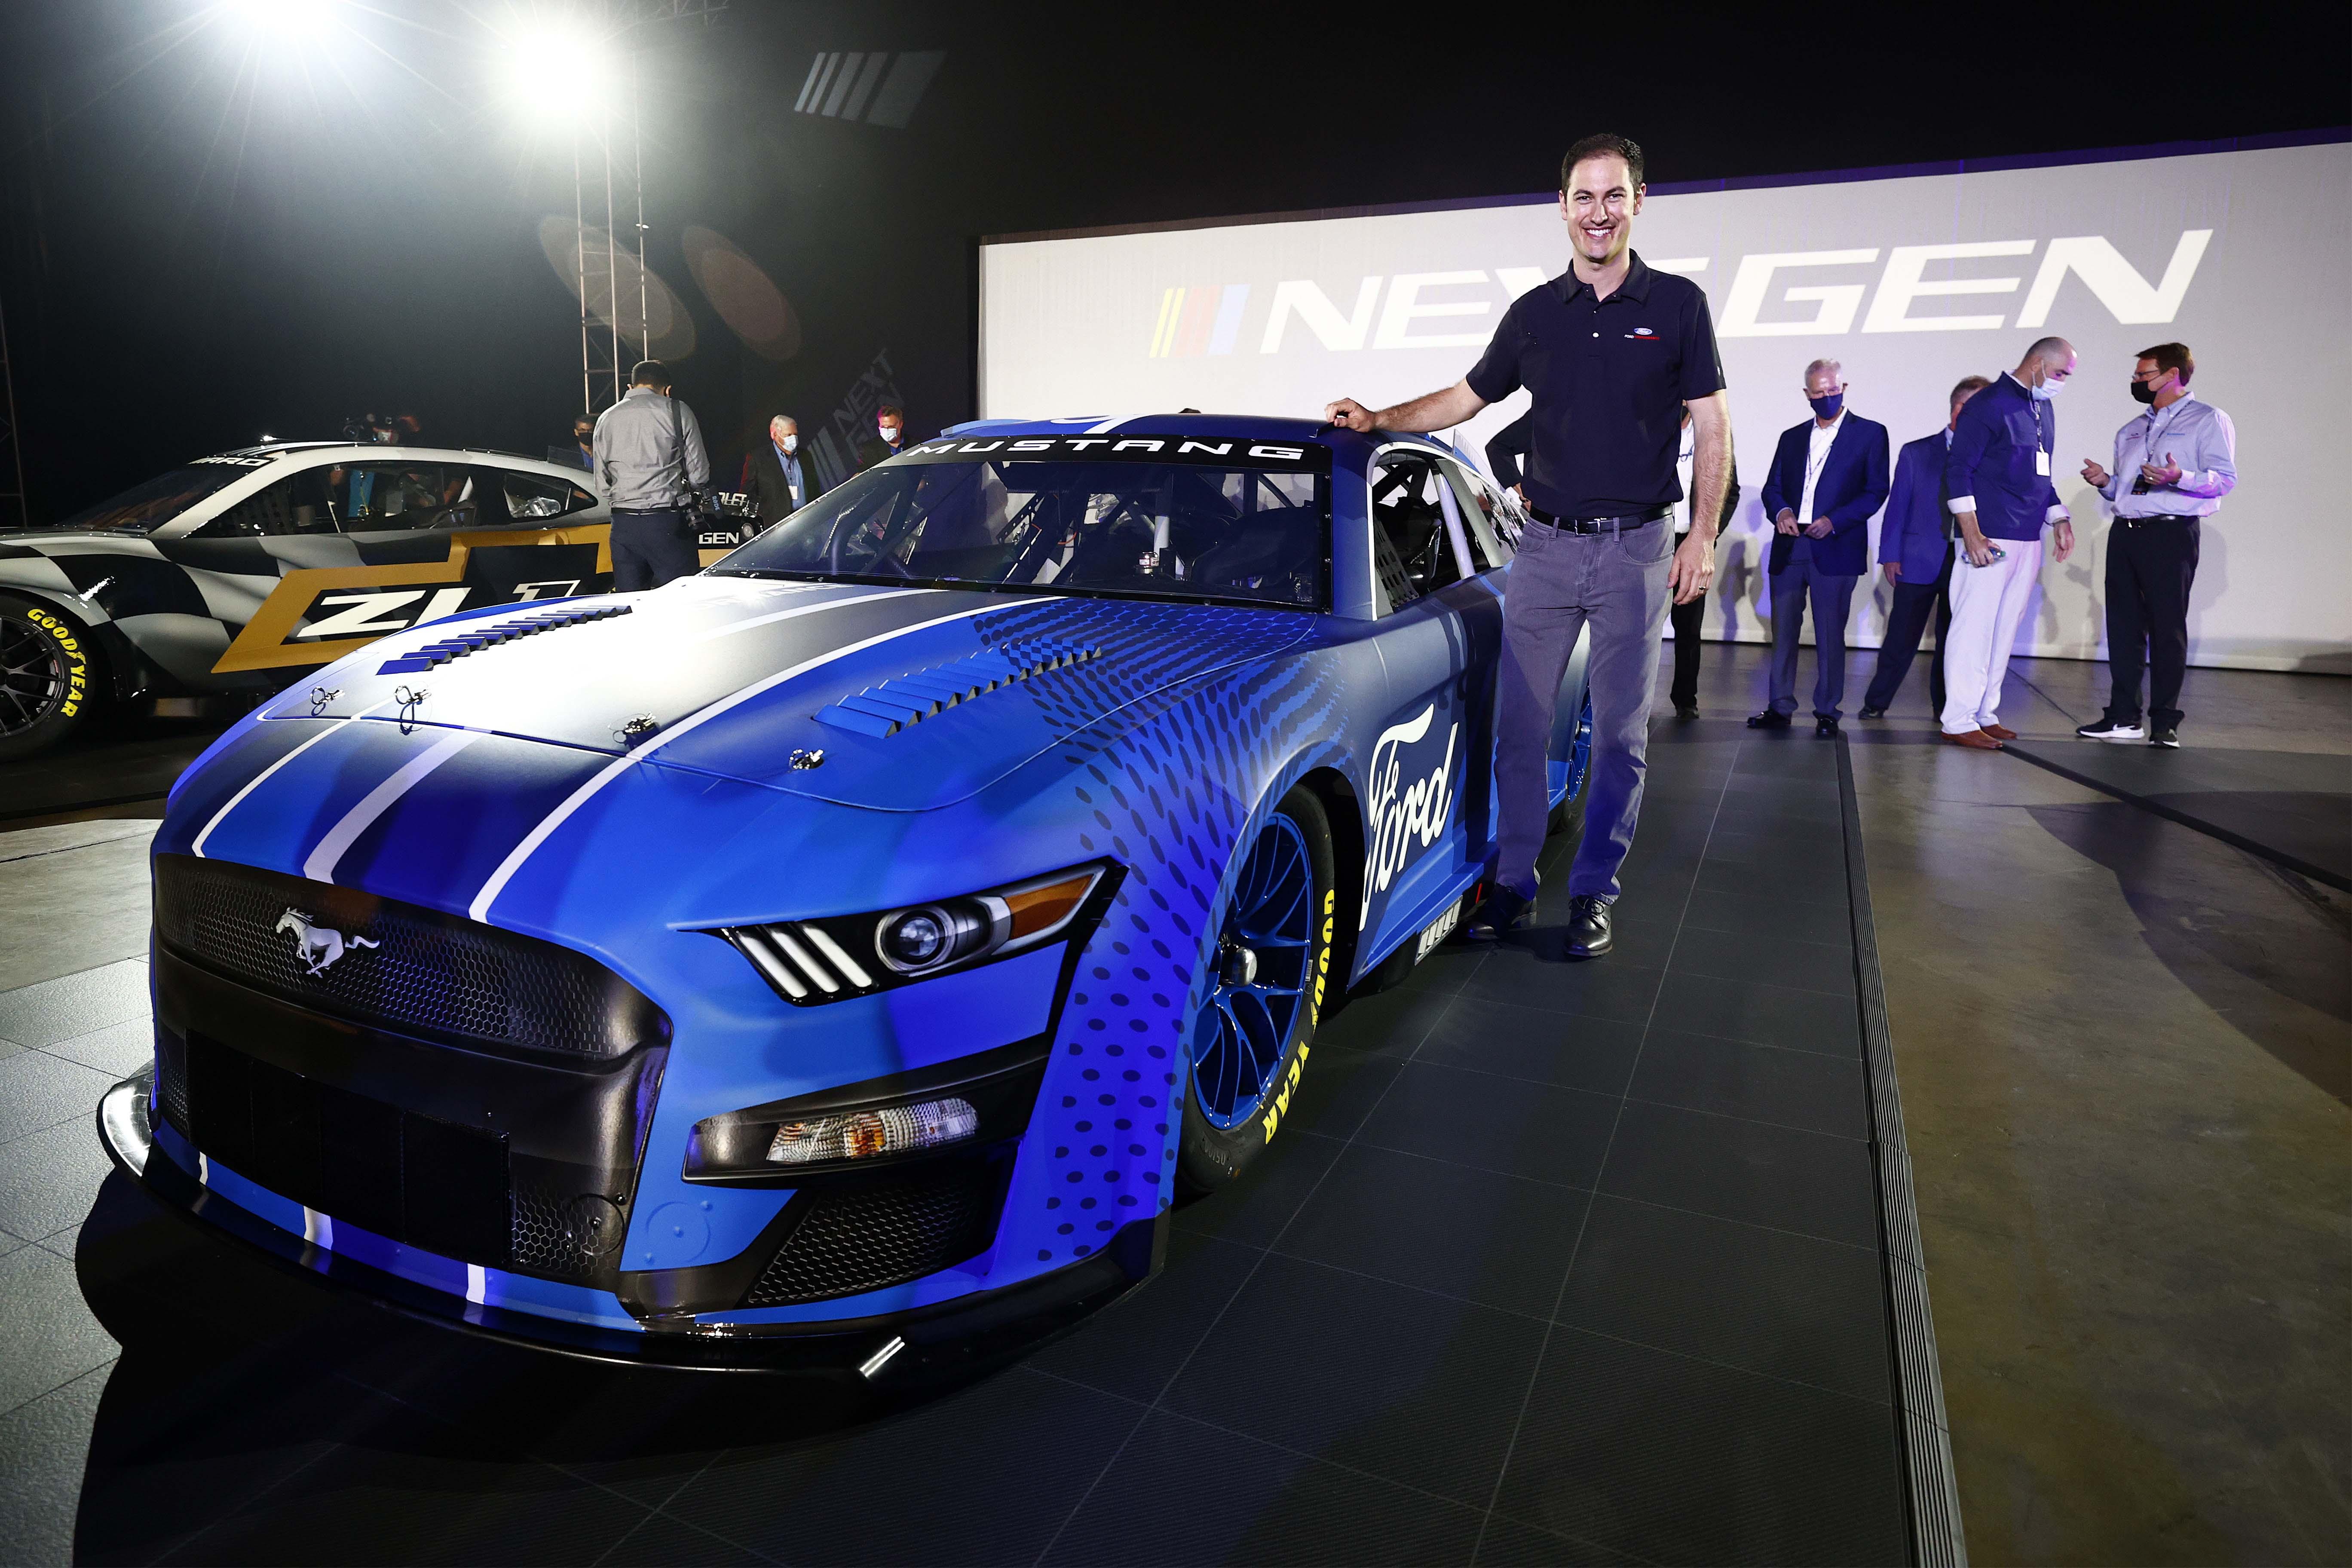 Joey Logano - NASCAR Next Gen